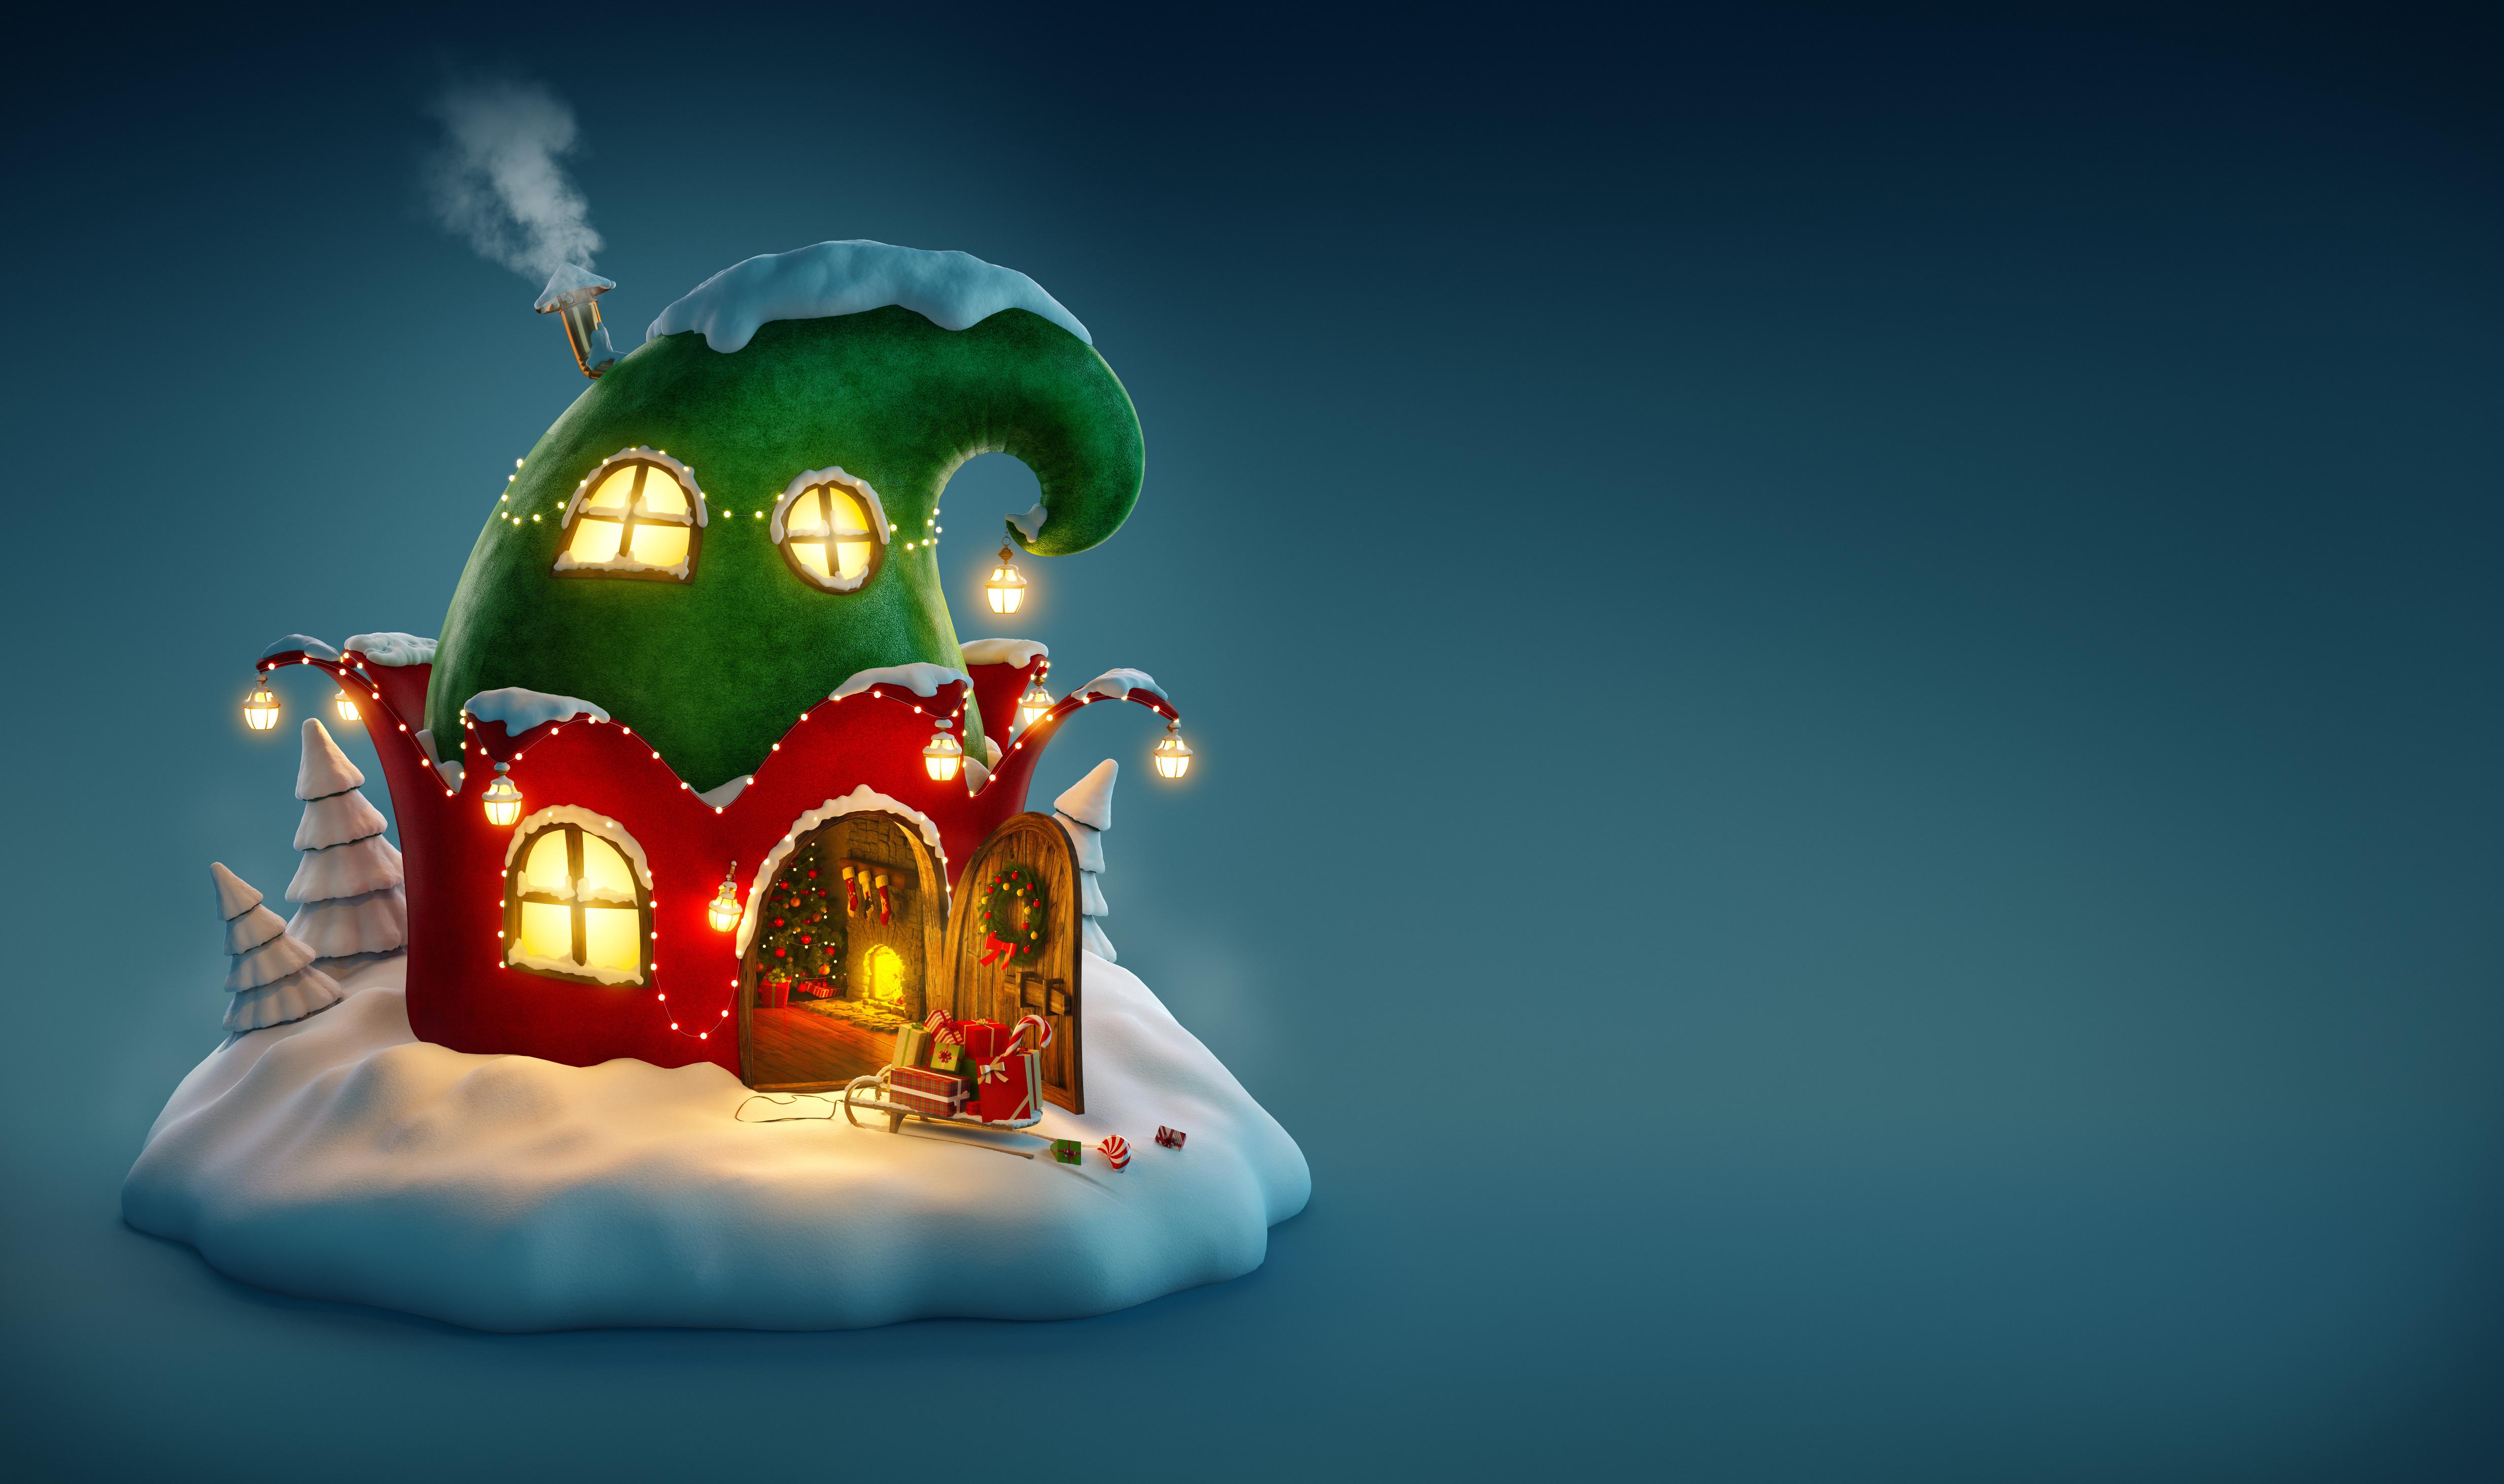 Christmas Elves Wallpaper Hd ...